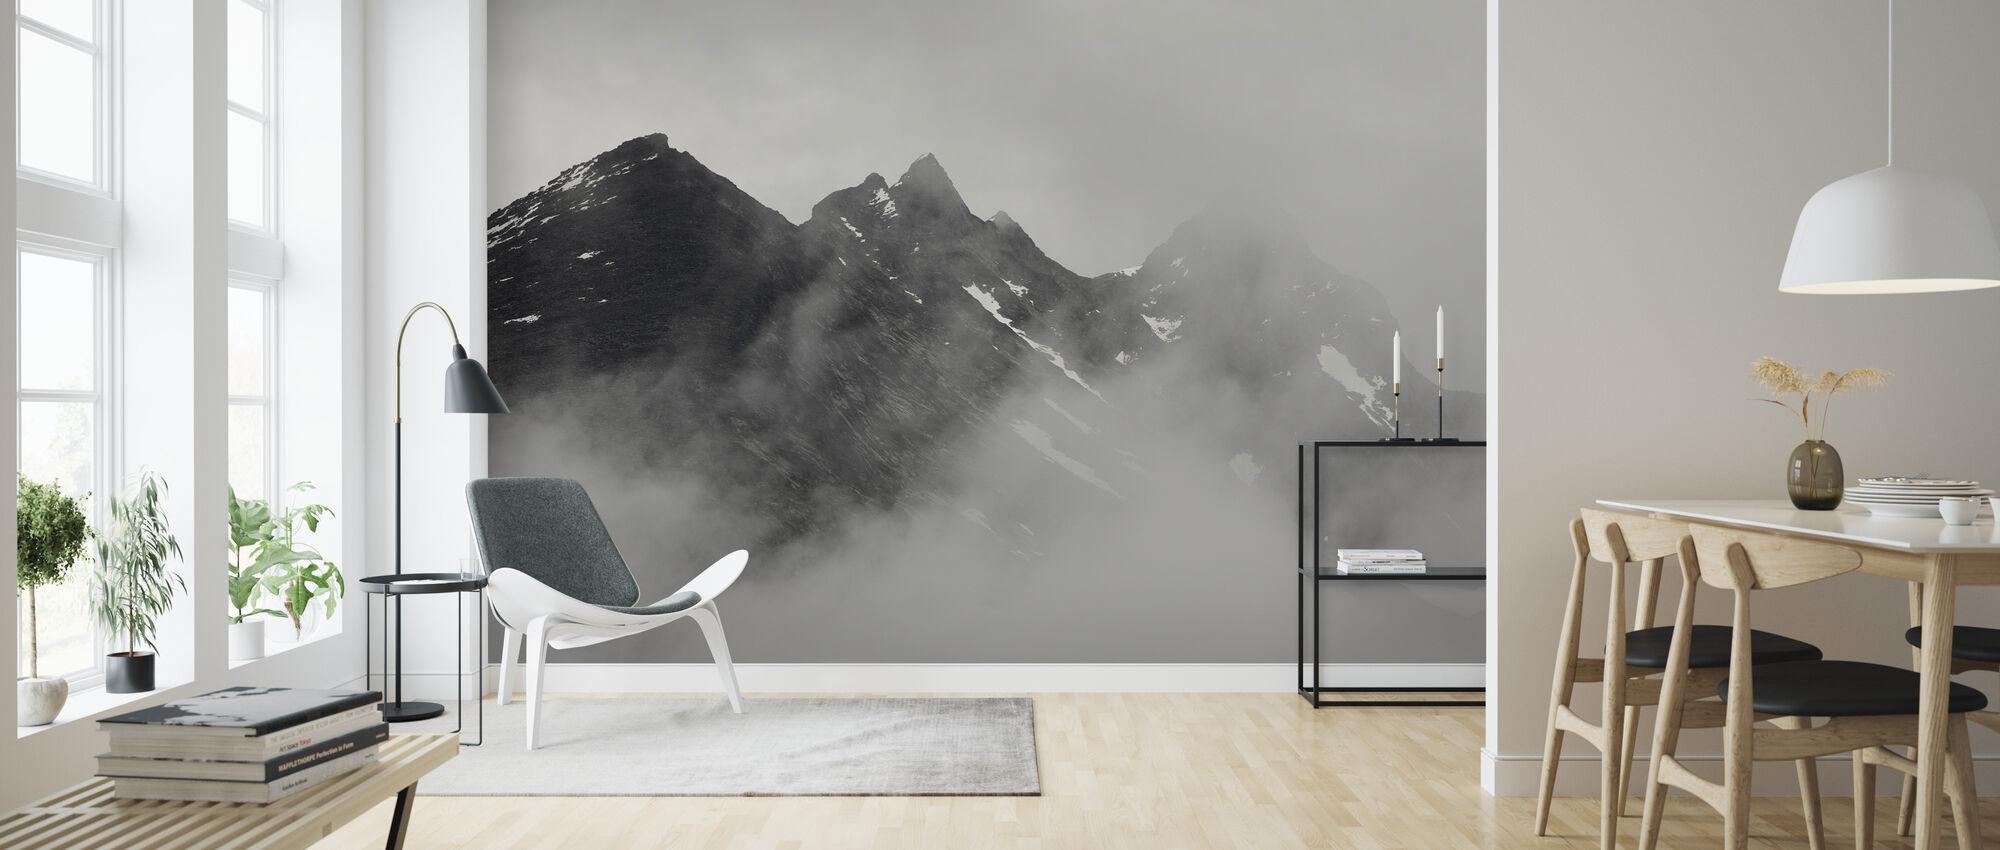 Vettisfossen-bjergene, Norge - Tapet - Stue